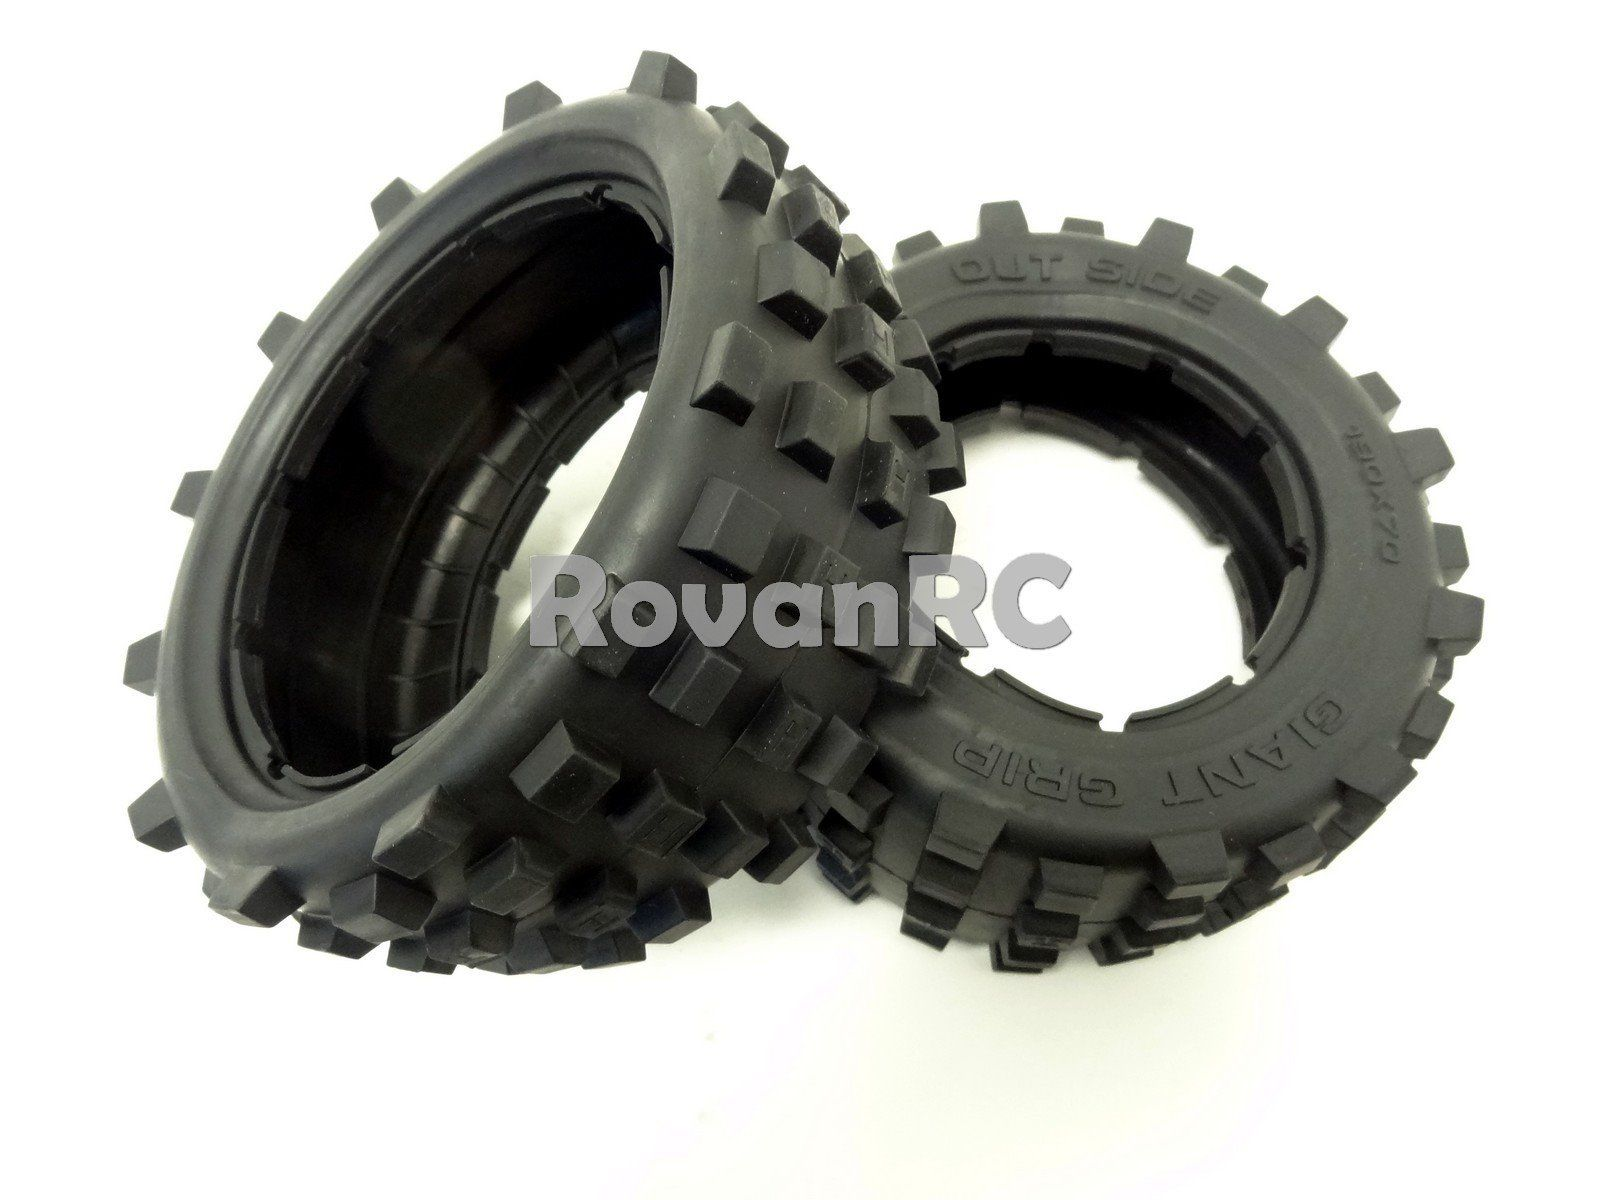 1 5 MadMax Giant Grip Monster Tires 2 LOSI 5IVE T DBXL King Motor X2 Rovan